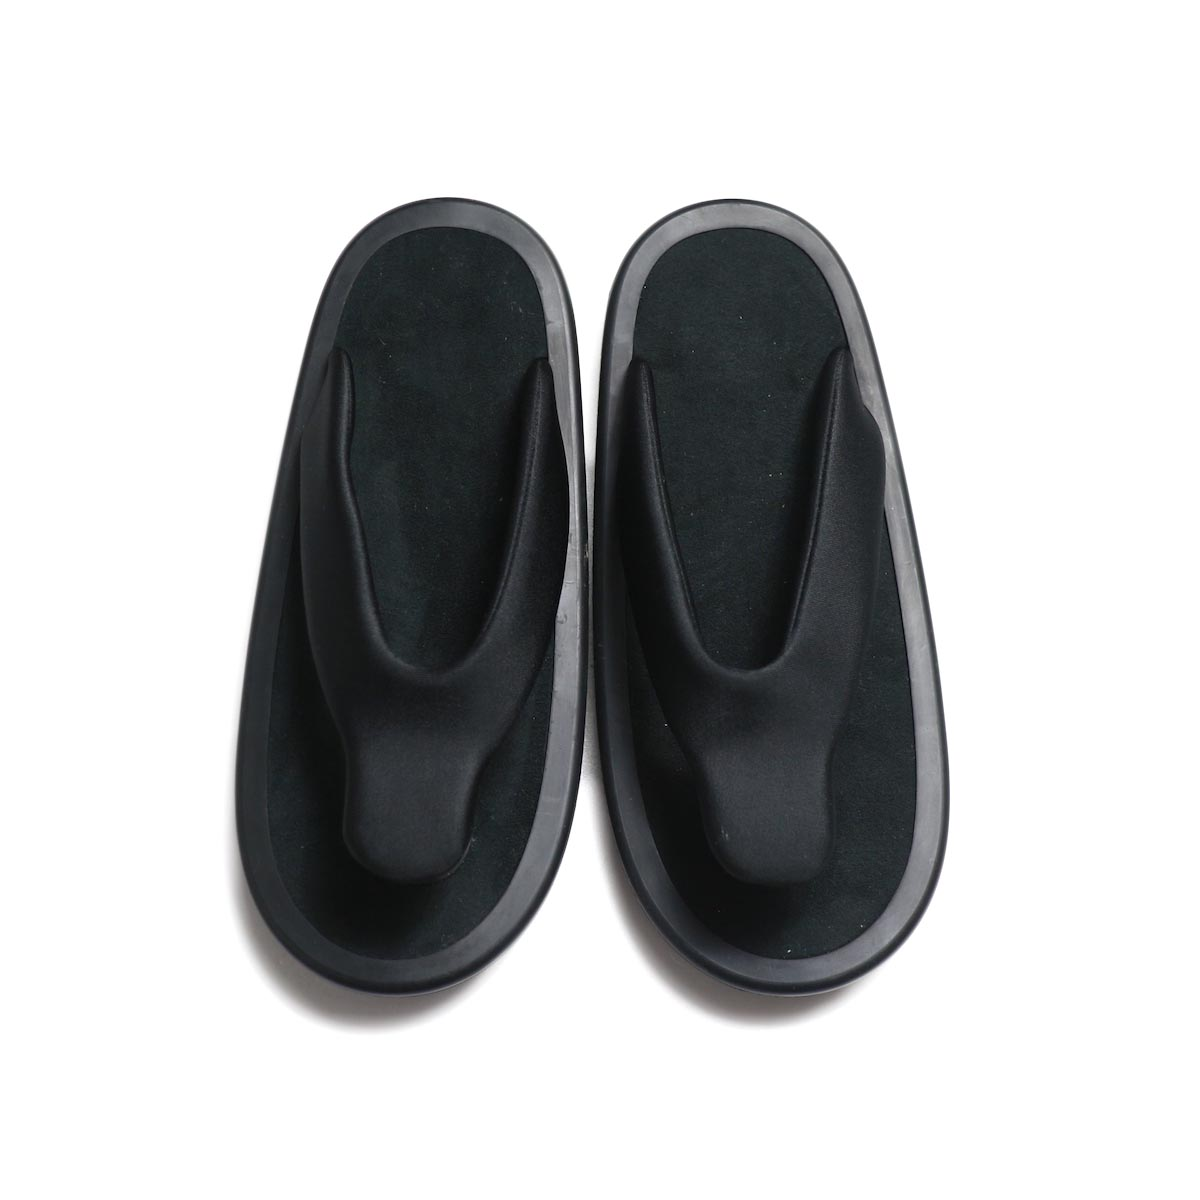 JOJO / SANDAL -Black (Black Suede) 正面